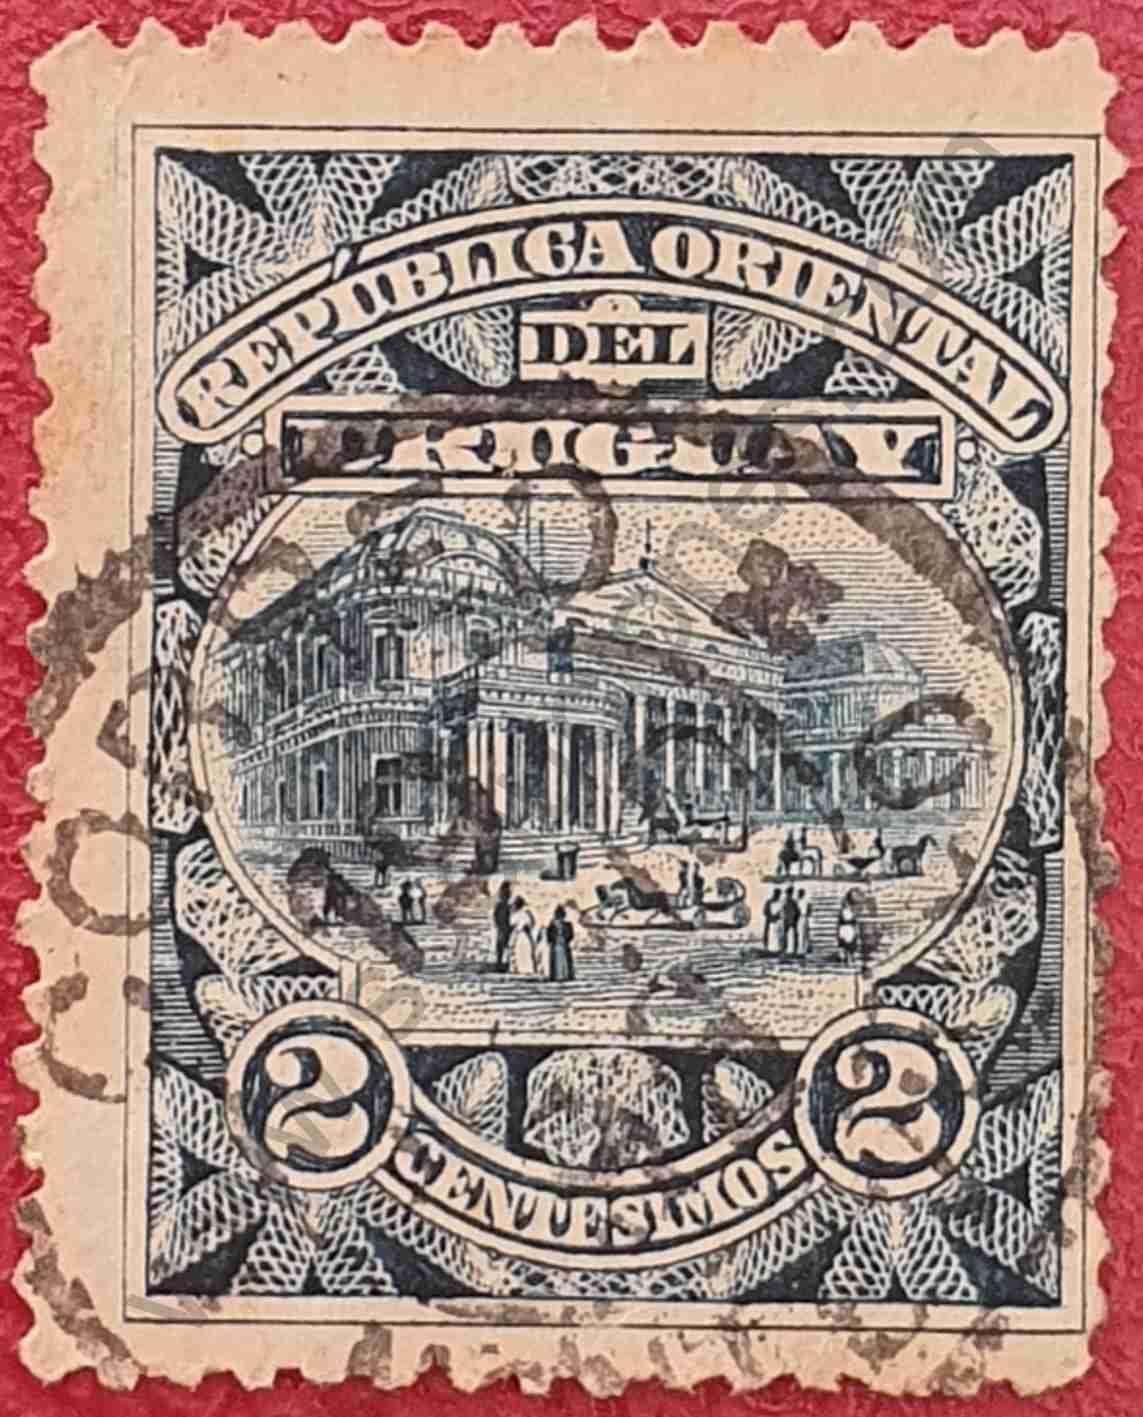 Sello del Teatro Solís - Uruguay 1895